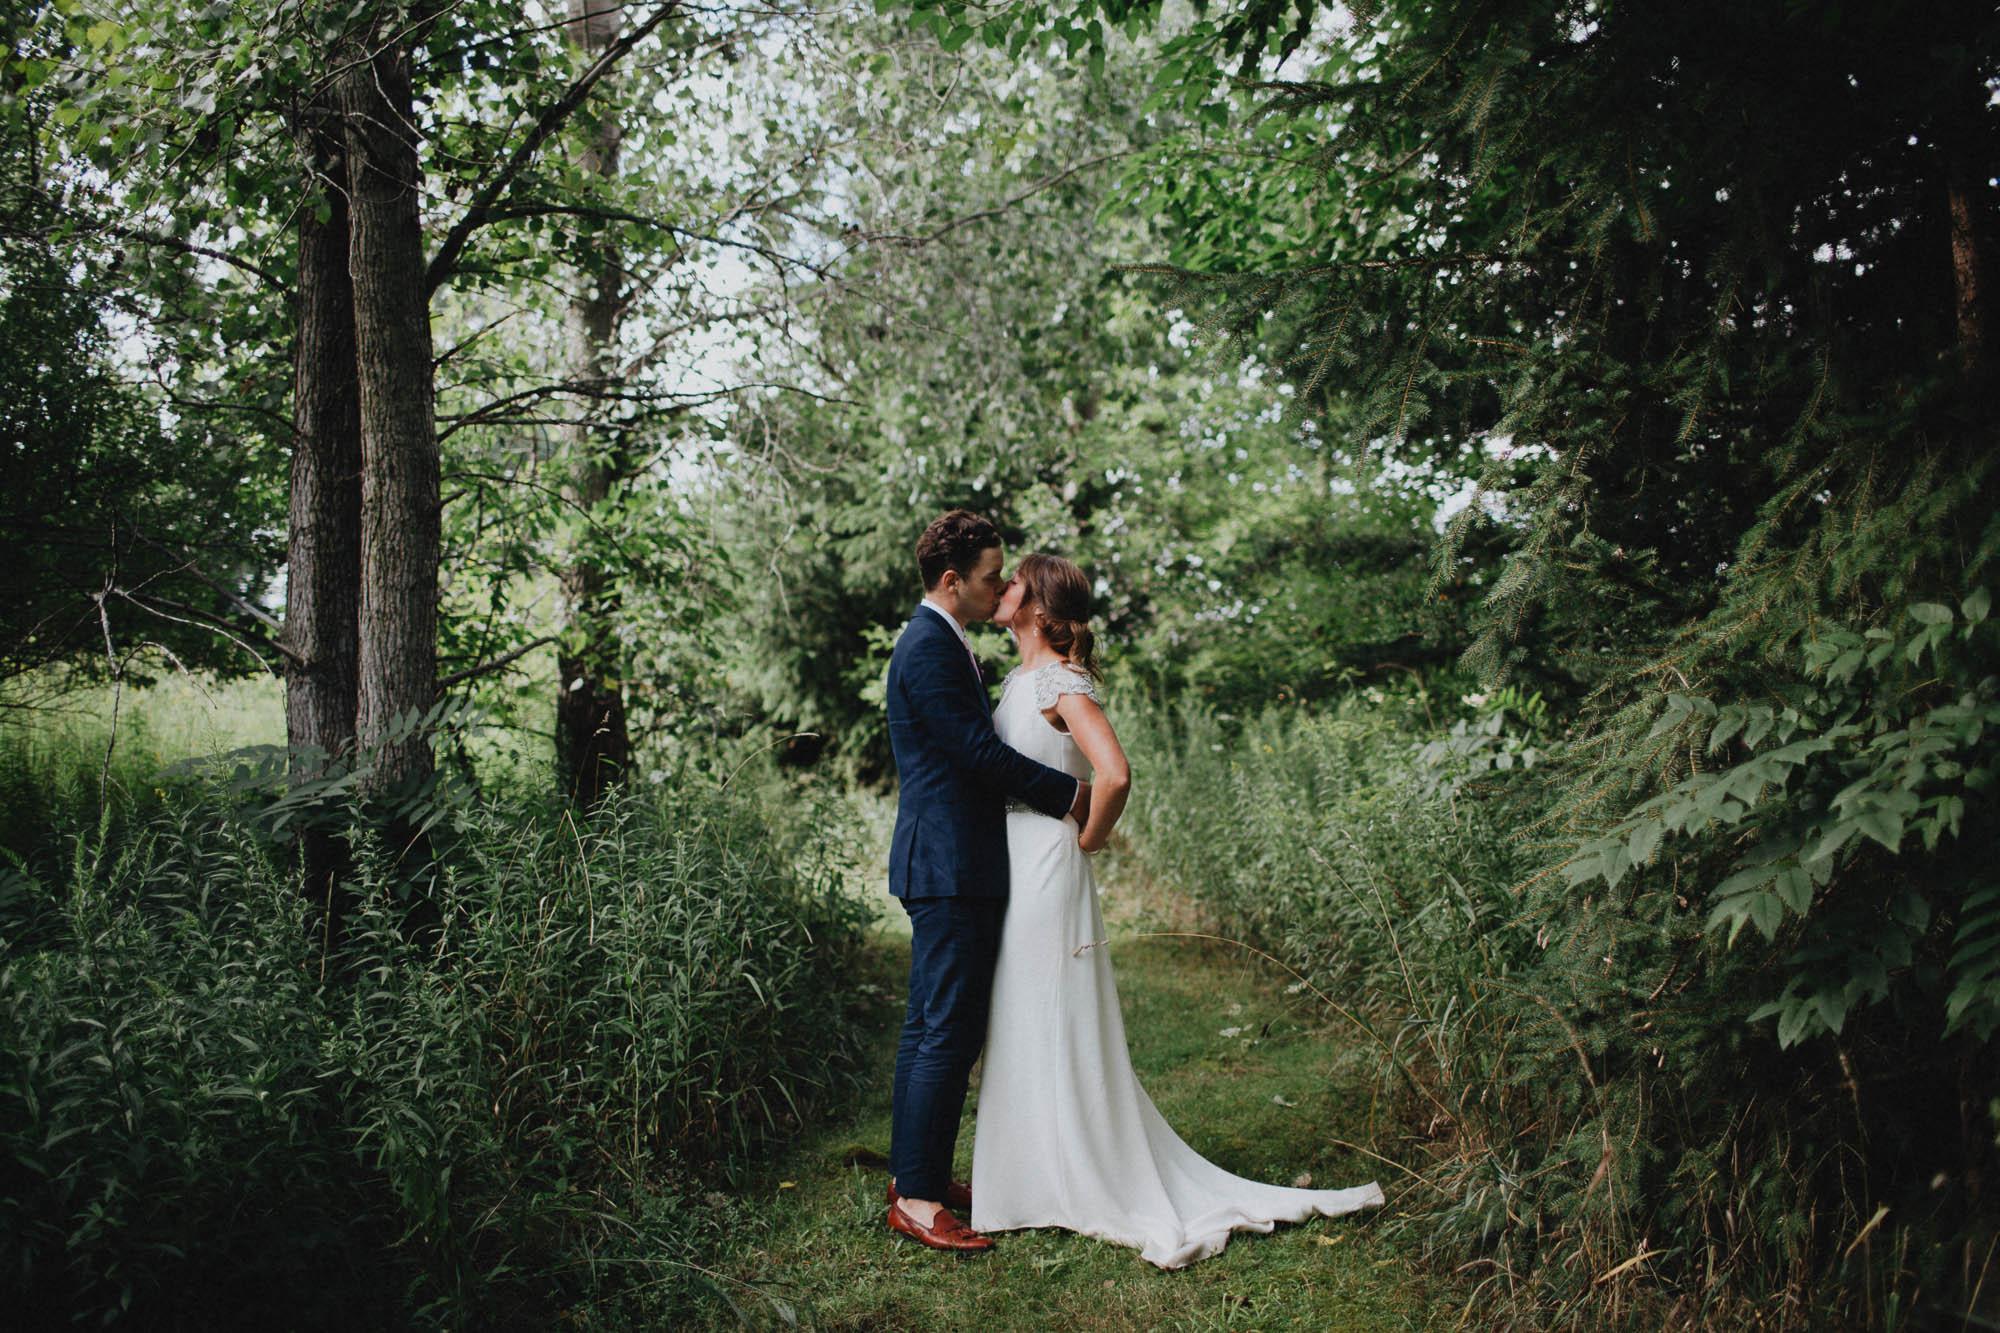 Leah-Graham-Michigan-Outdoor-DIY-Wedding-076@2x.jpg